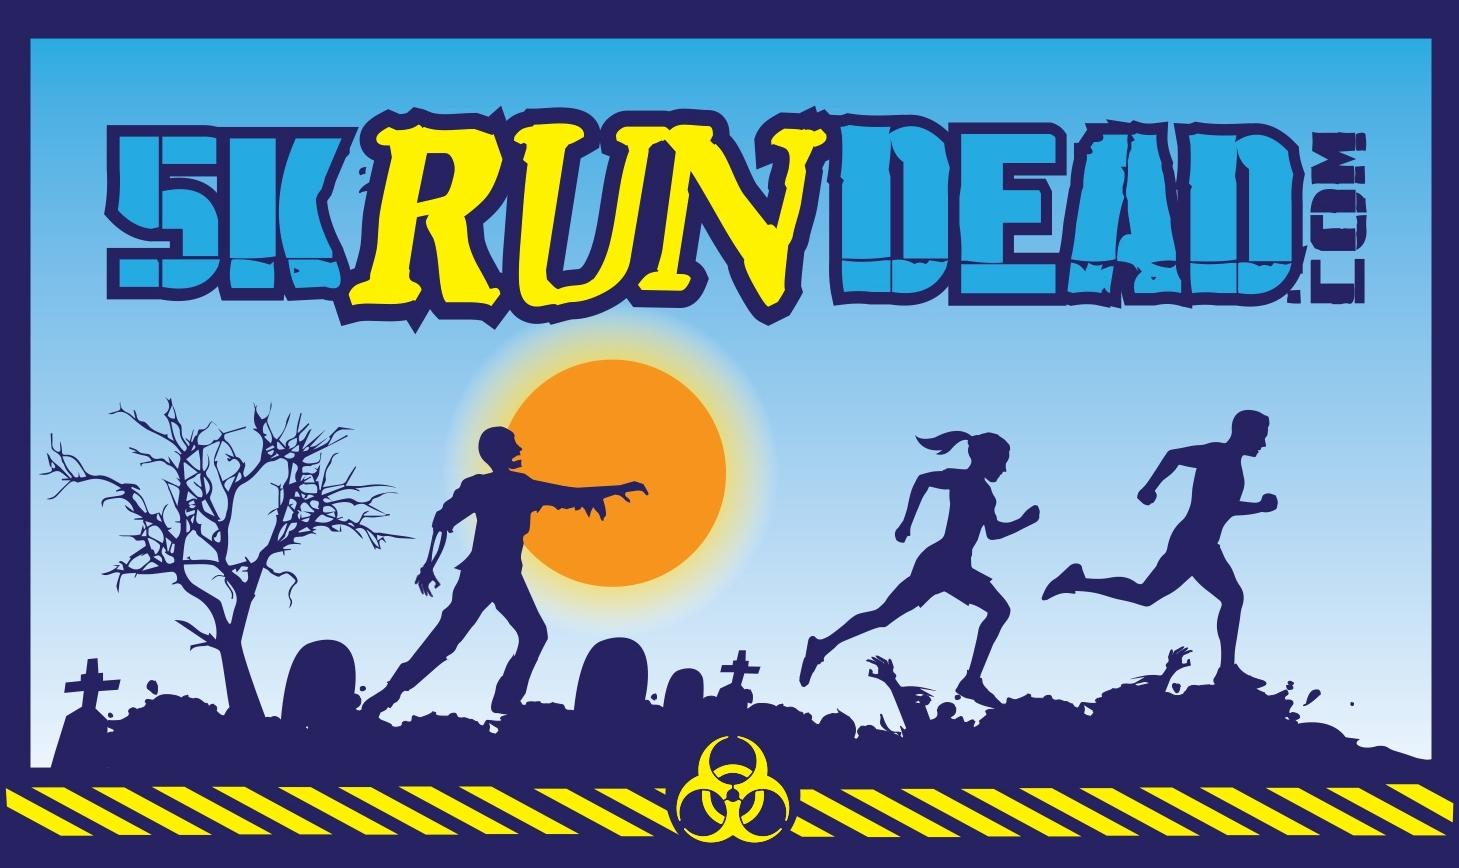 5KRunDead Zombie Run - Houston, TX